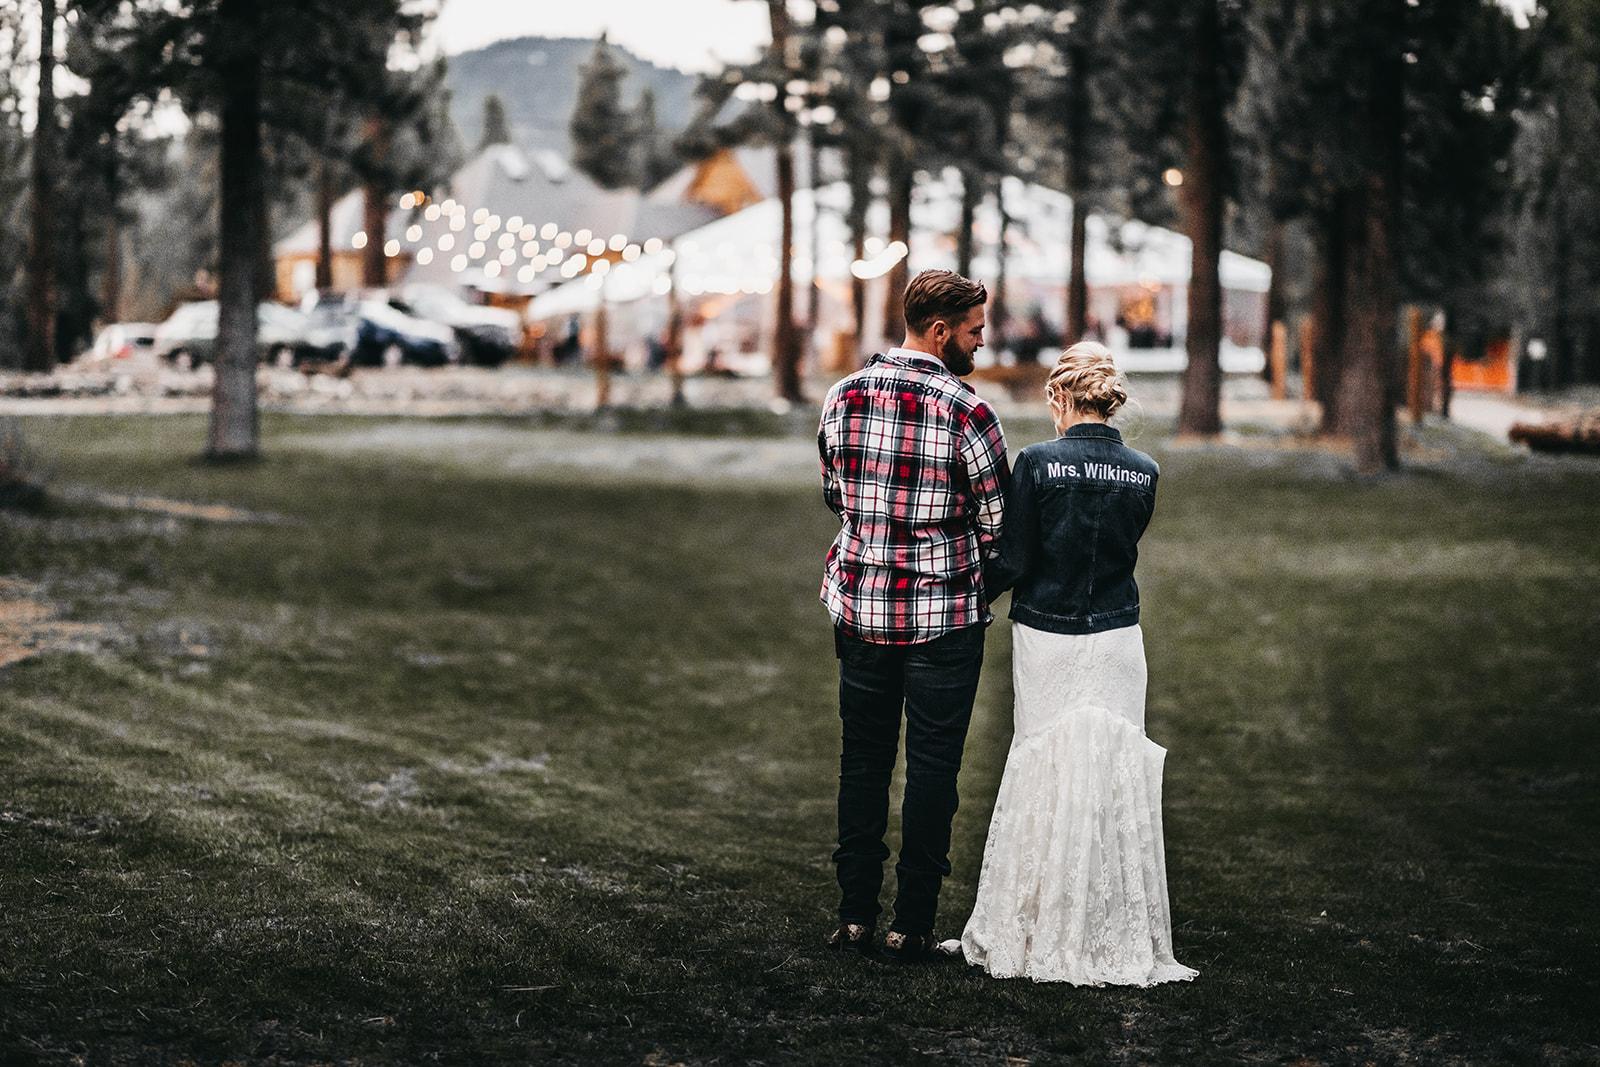 vild-vild photography-photography-lake tahoe-tahoe-tahoe wedding-lake tahoe wedding photographer-649_websize.jpg